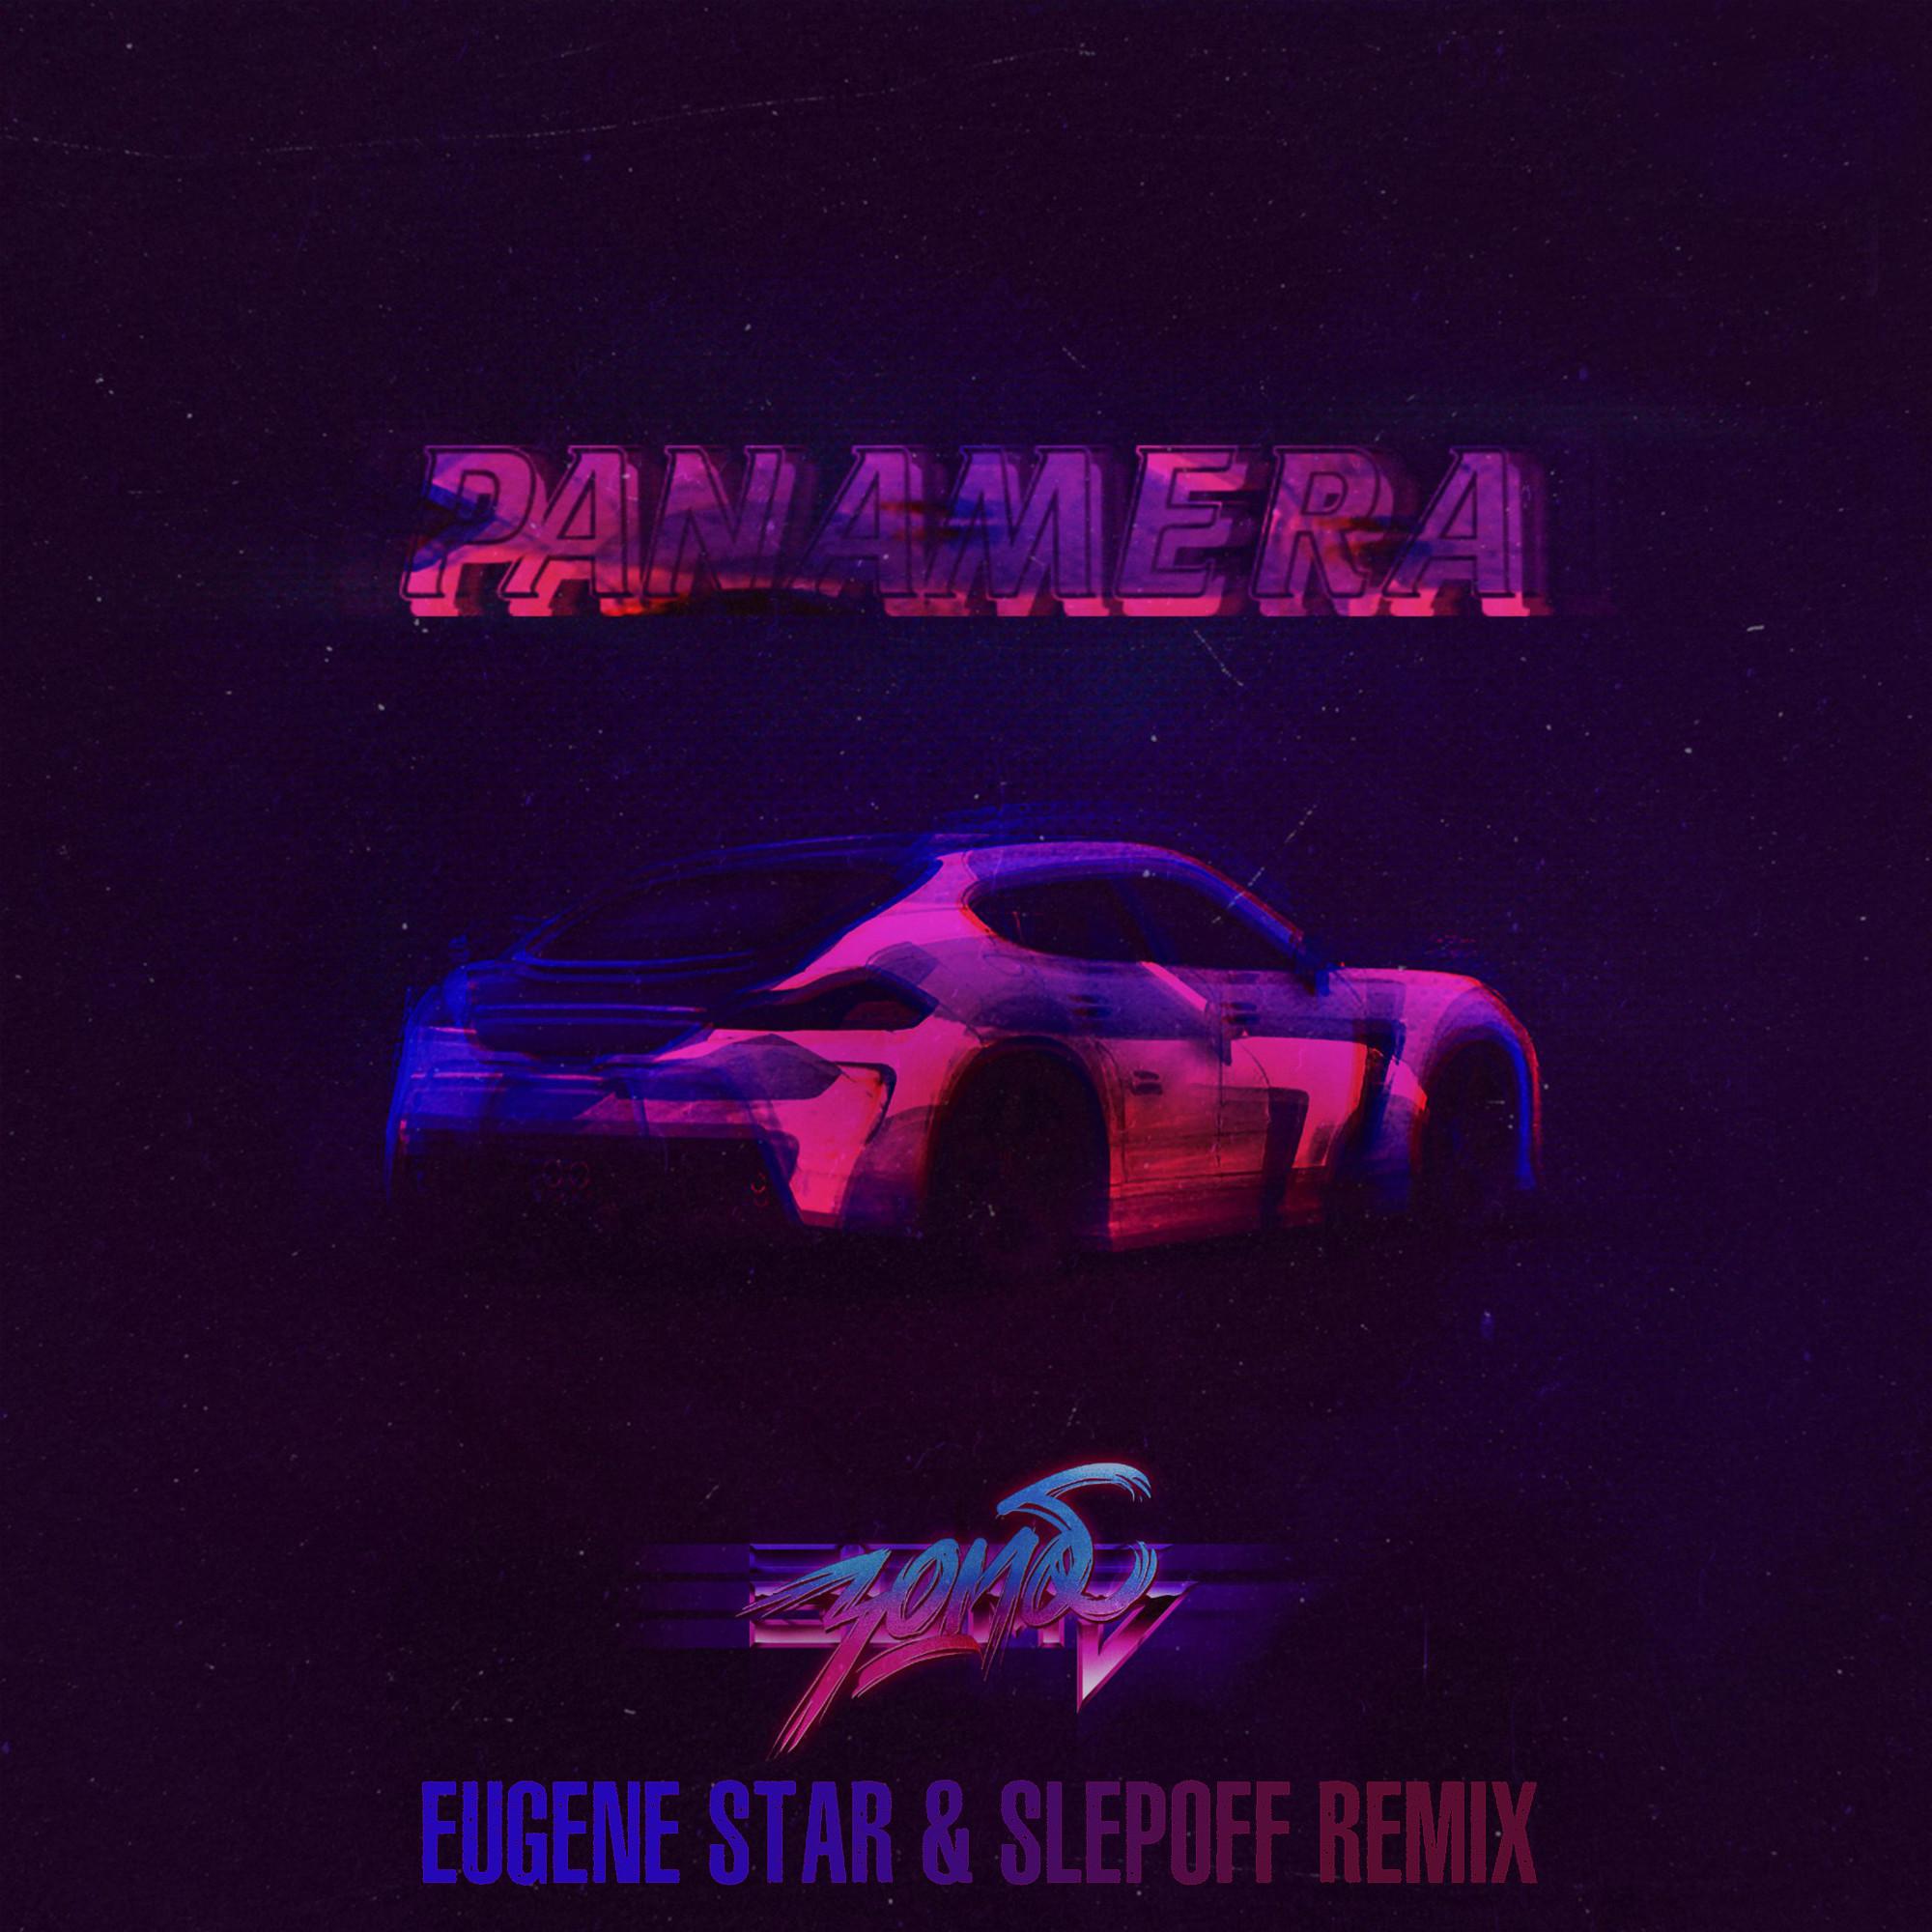 Download Lagu Dj Snake Taki Taki 320: Панамера (Eugene Star & Slepoff Remix) Radio Edit